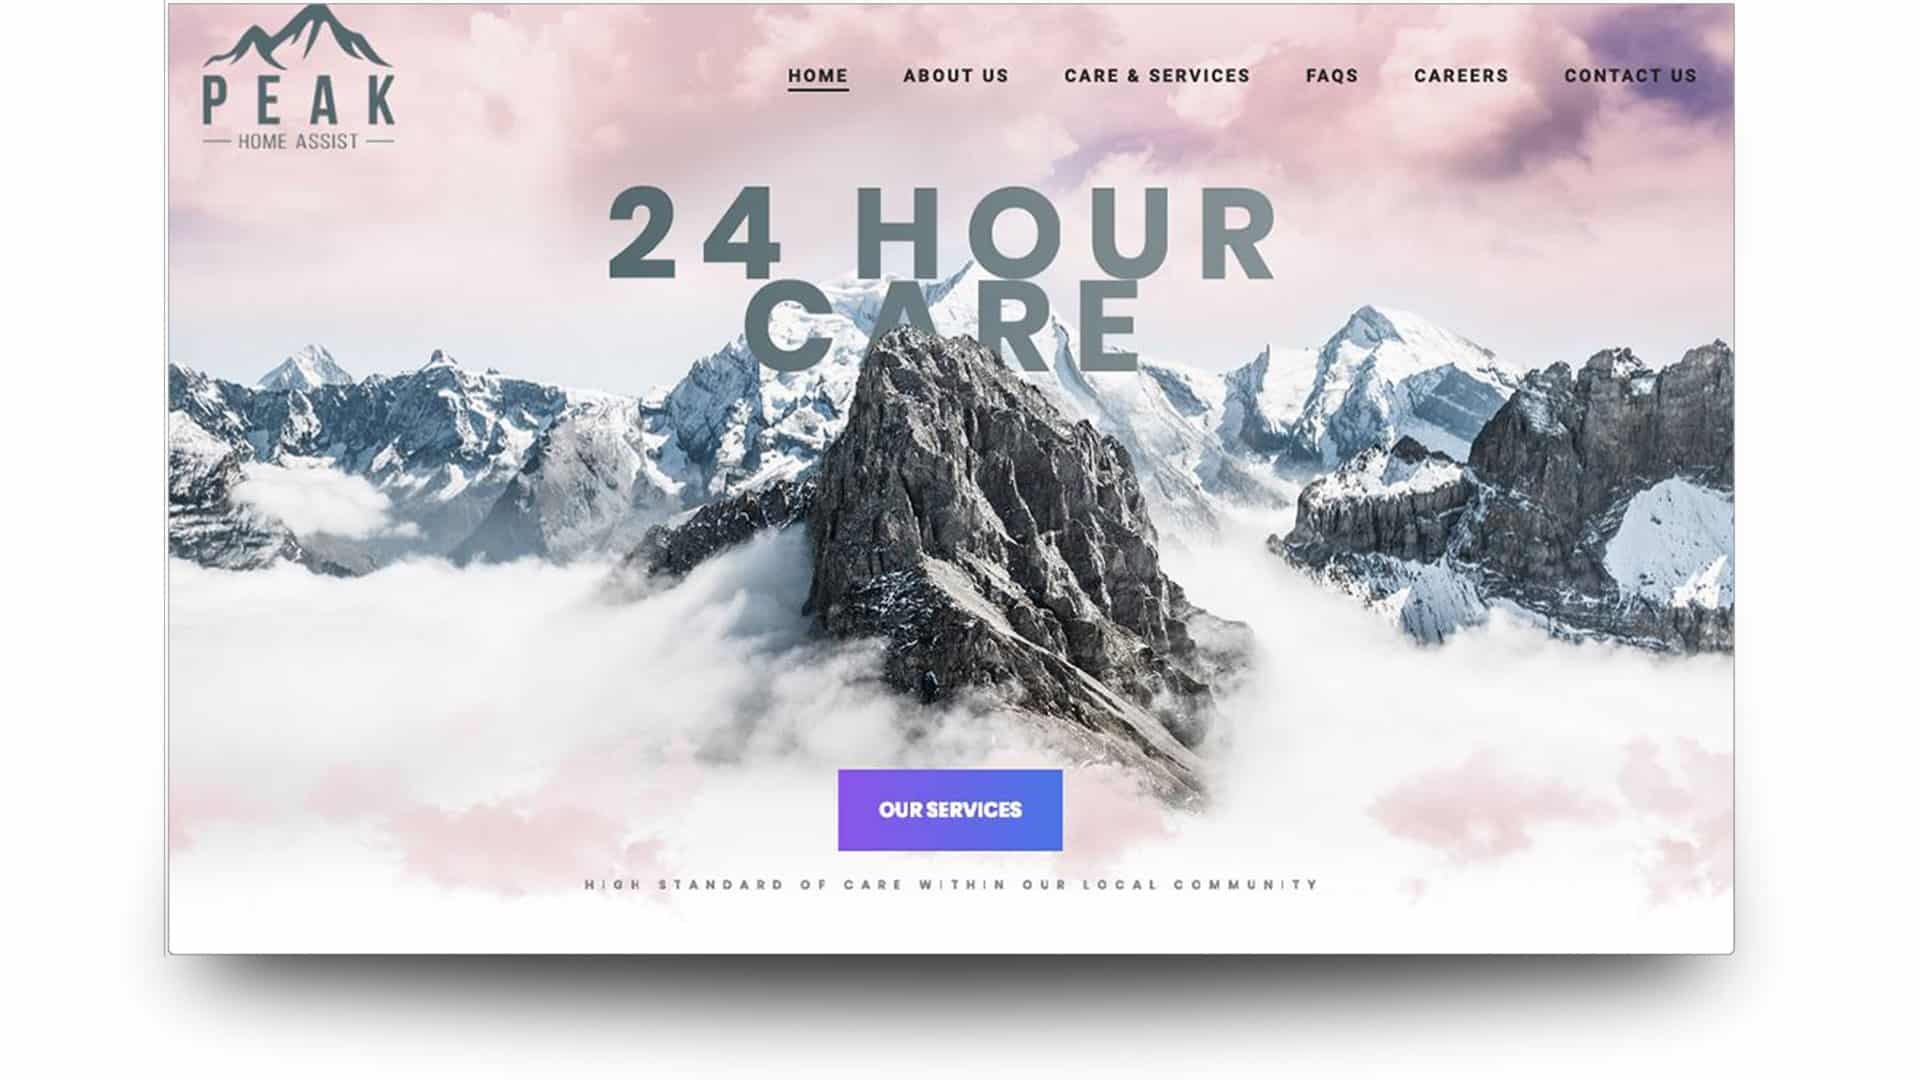 peak home assist - wordpress website design